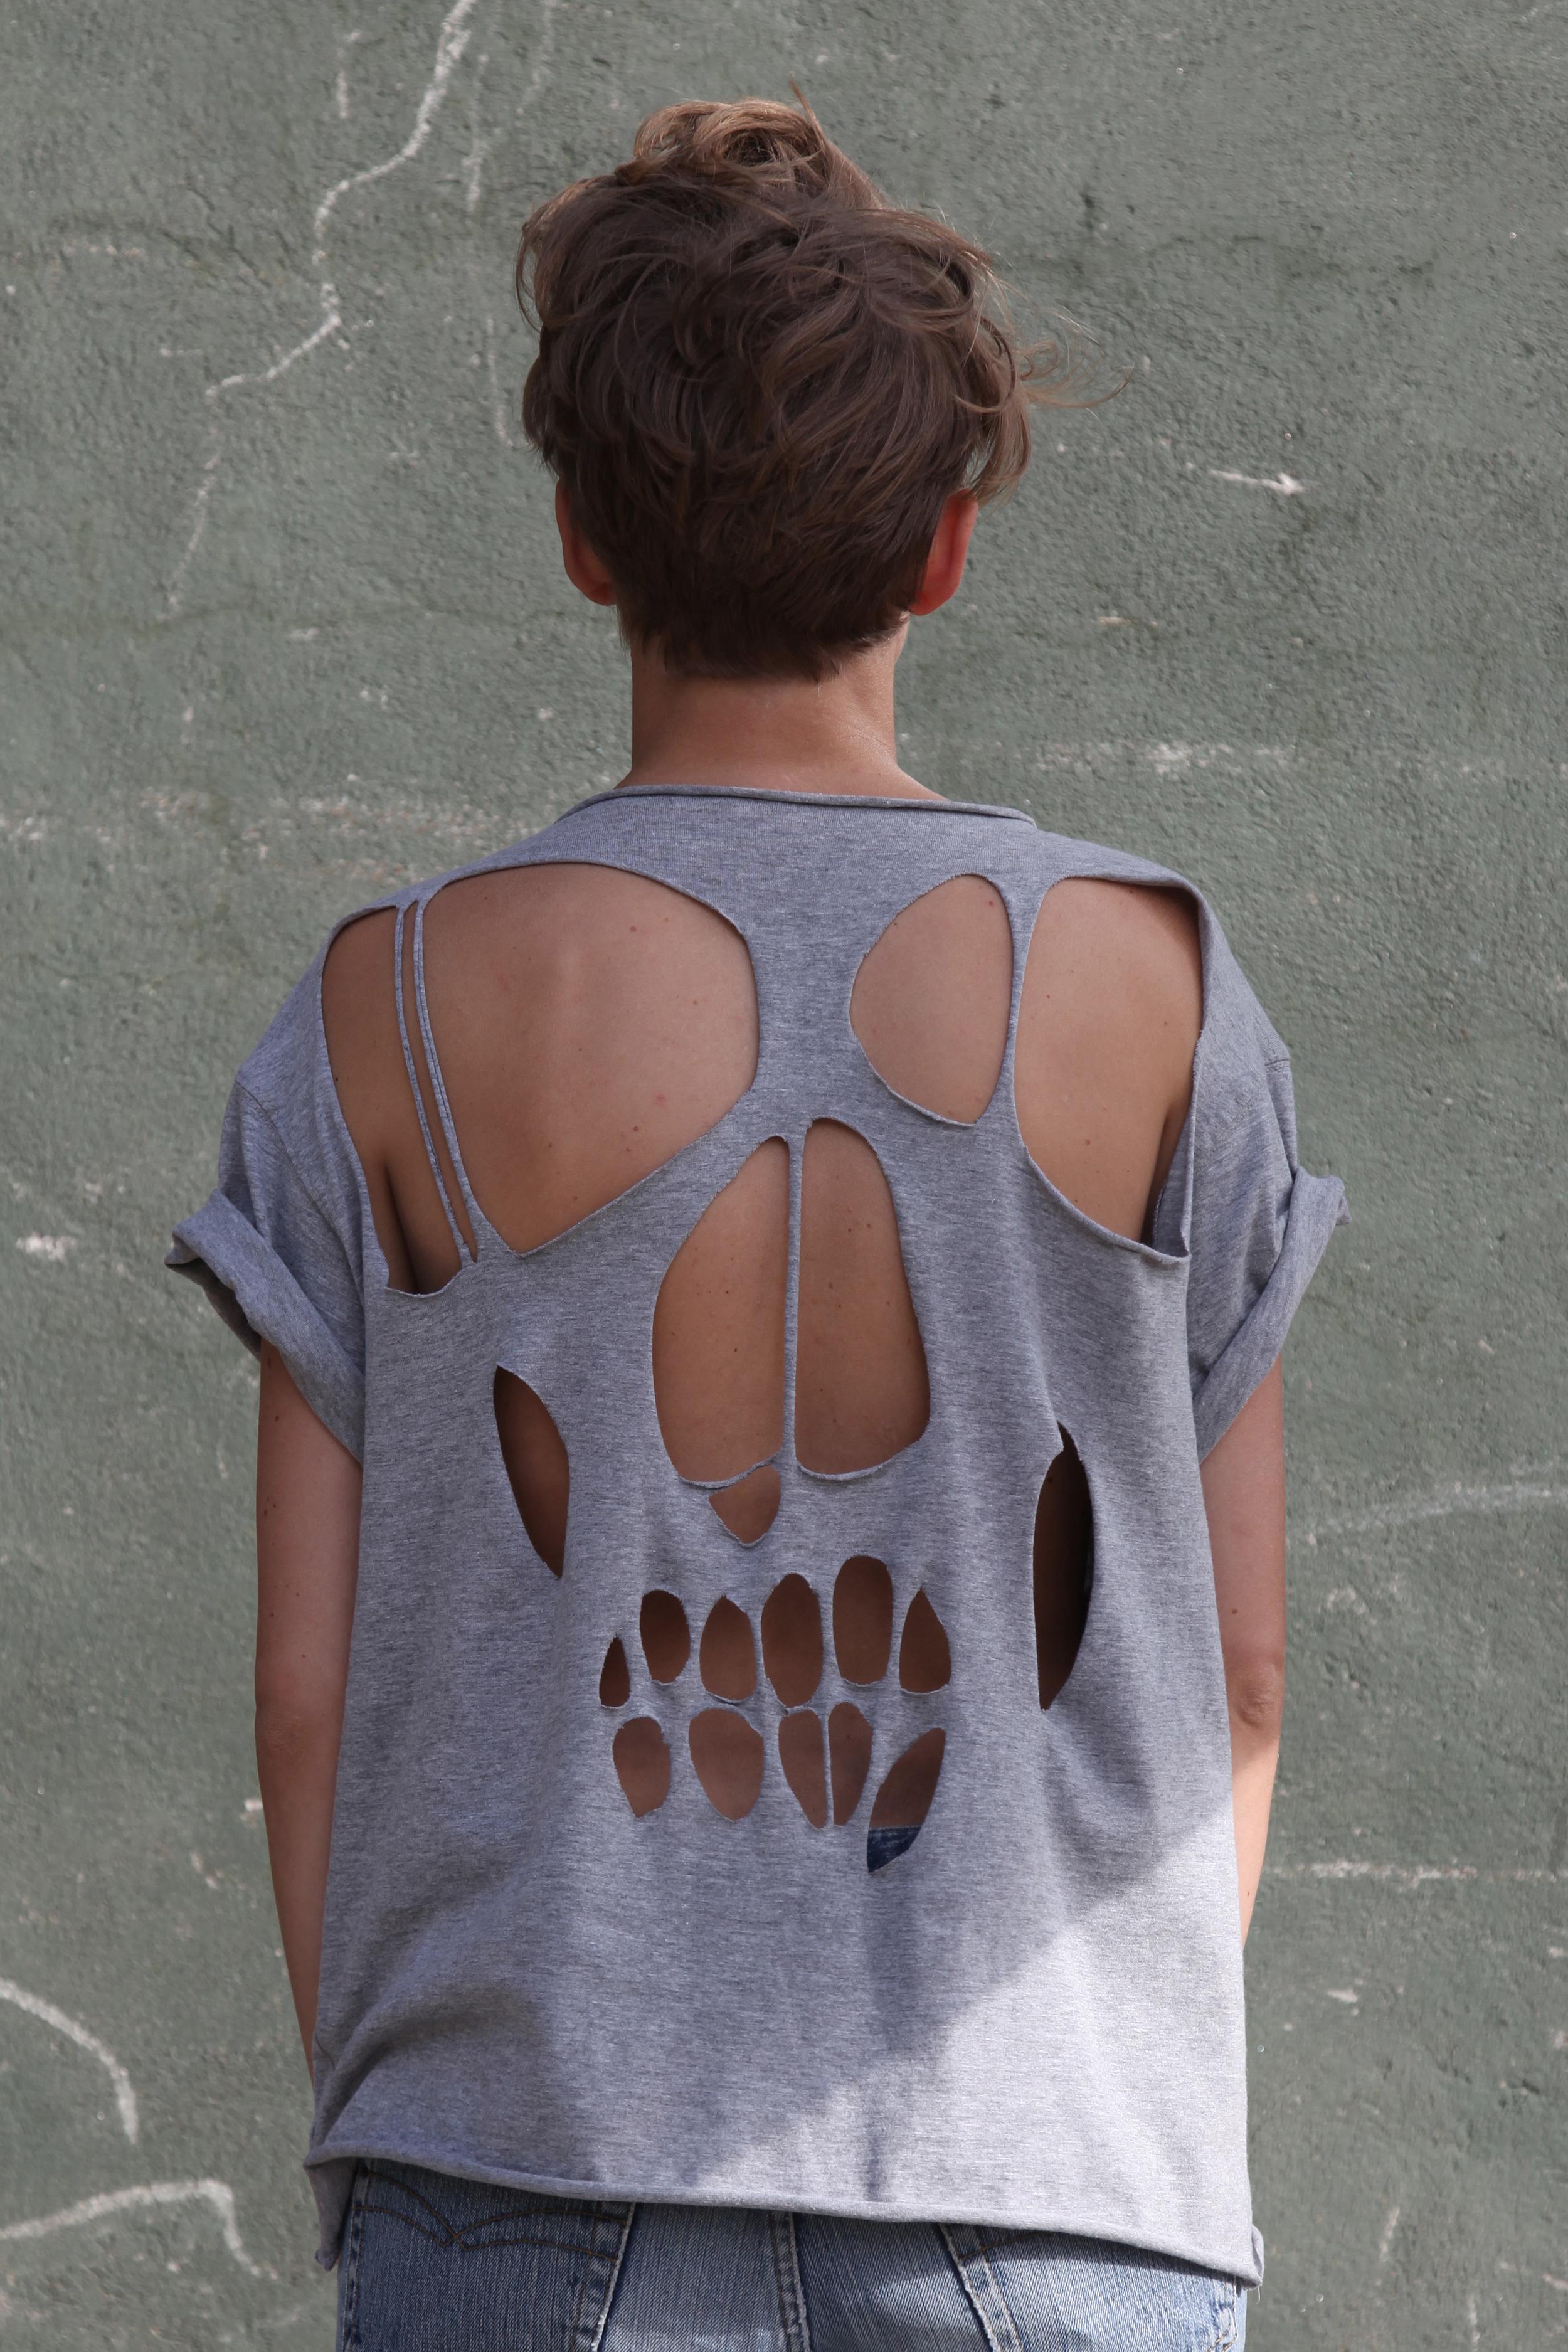 AnotherBlog_DIY_Tshirt3.jpg